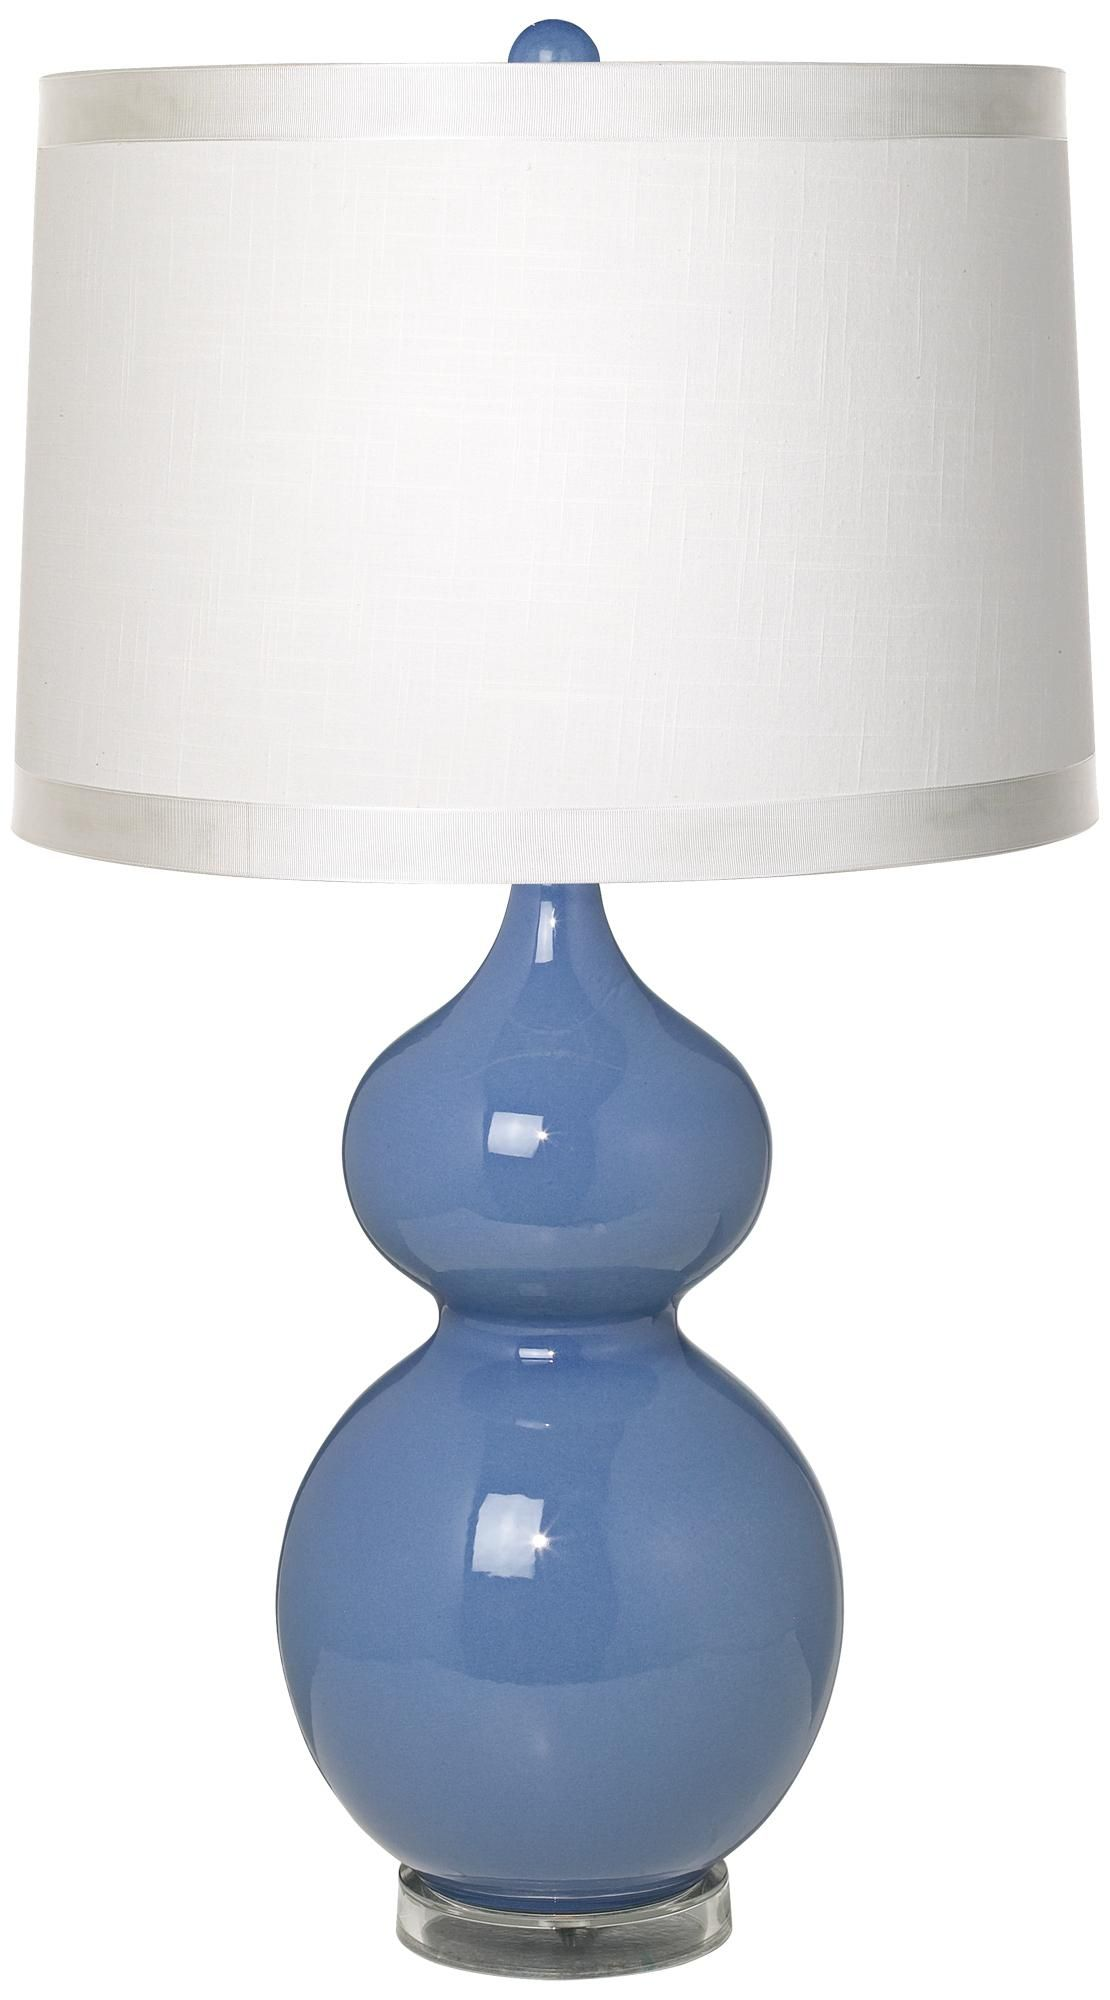 White Drum Shade Double Gourd Slate Blue Ceramic Table Lamp